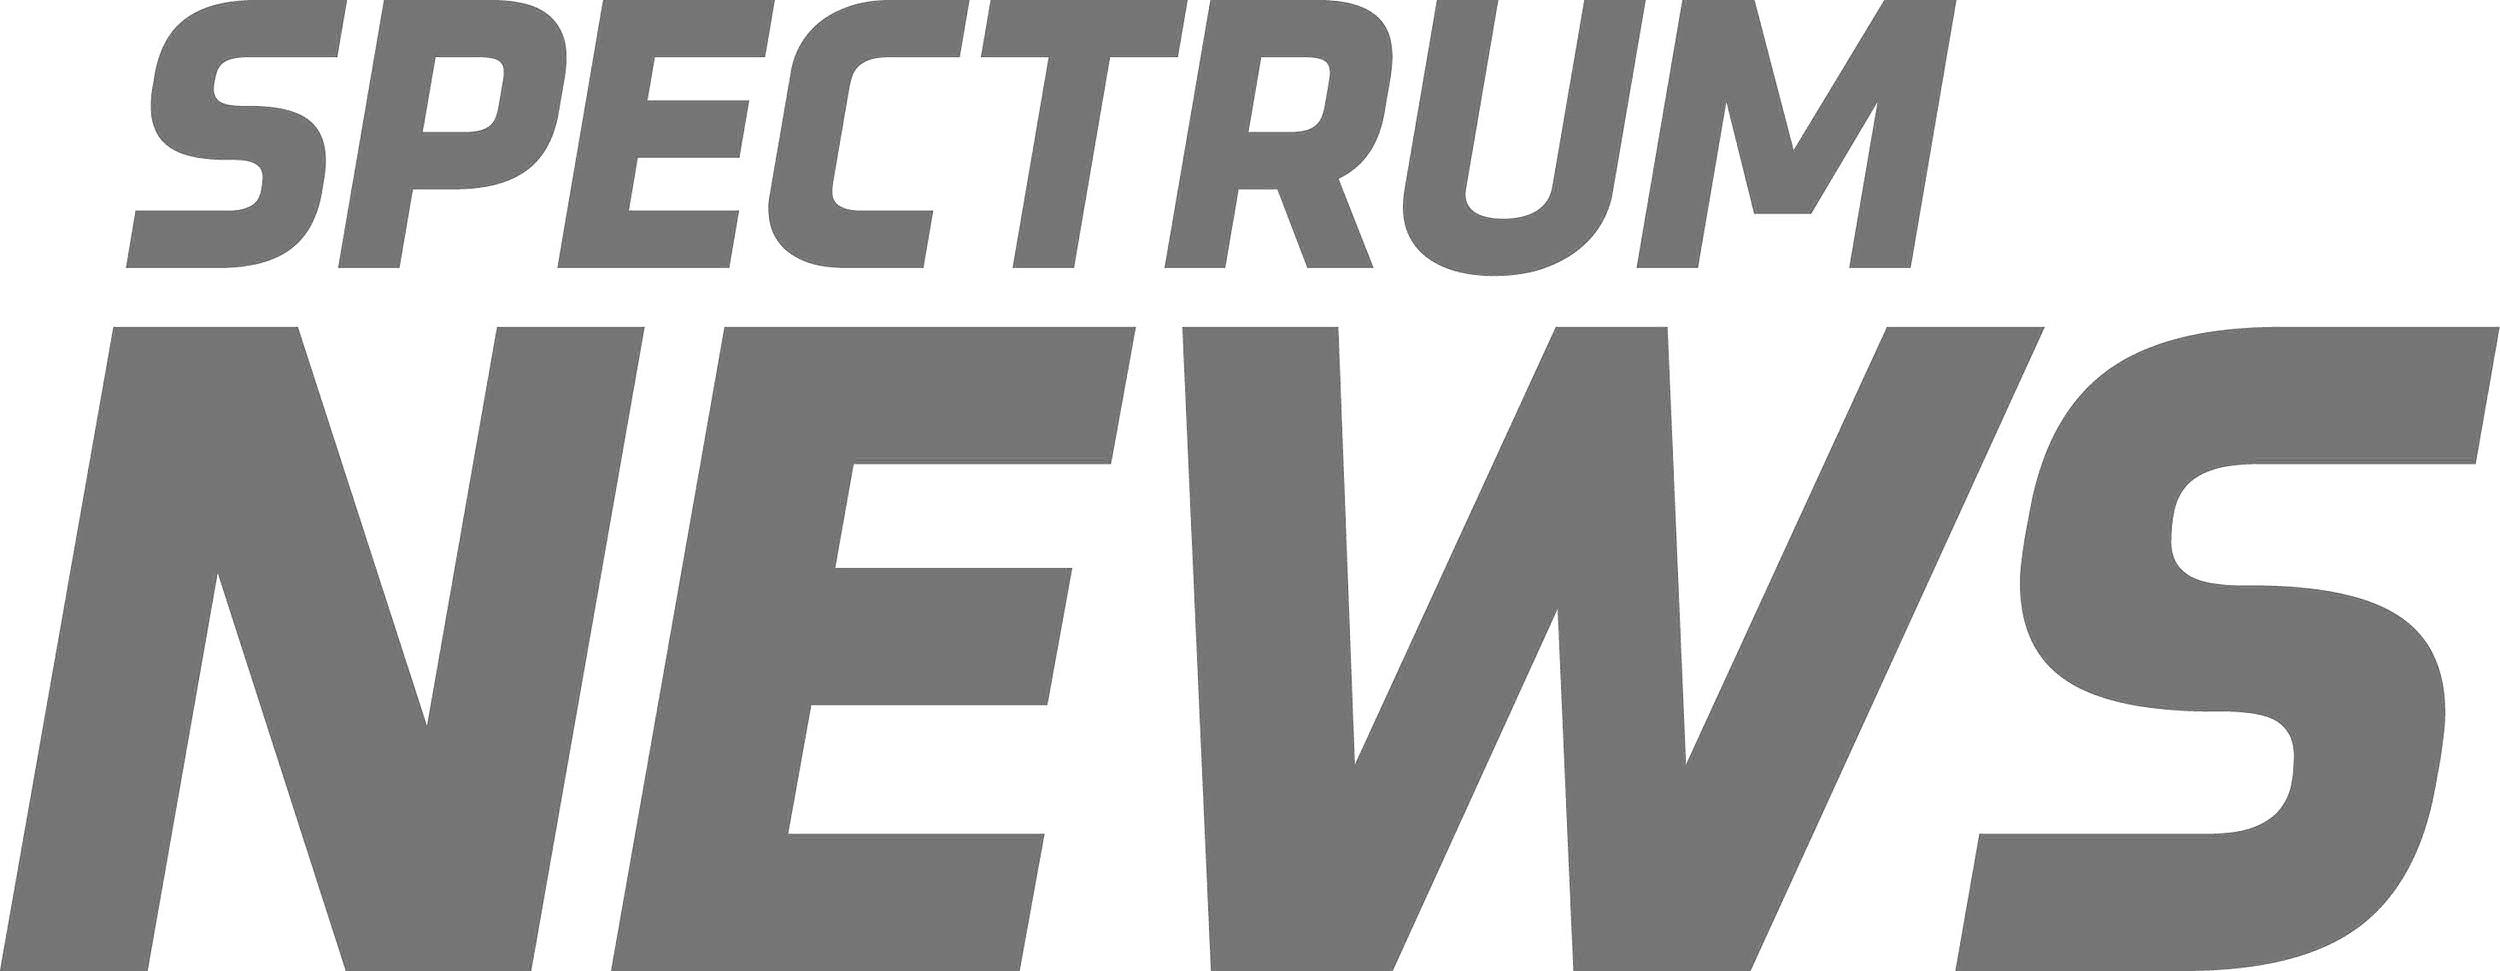 Spectrum_News.jpg